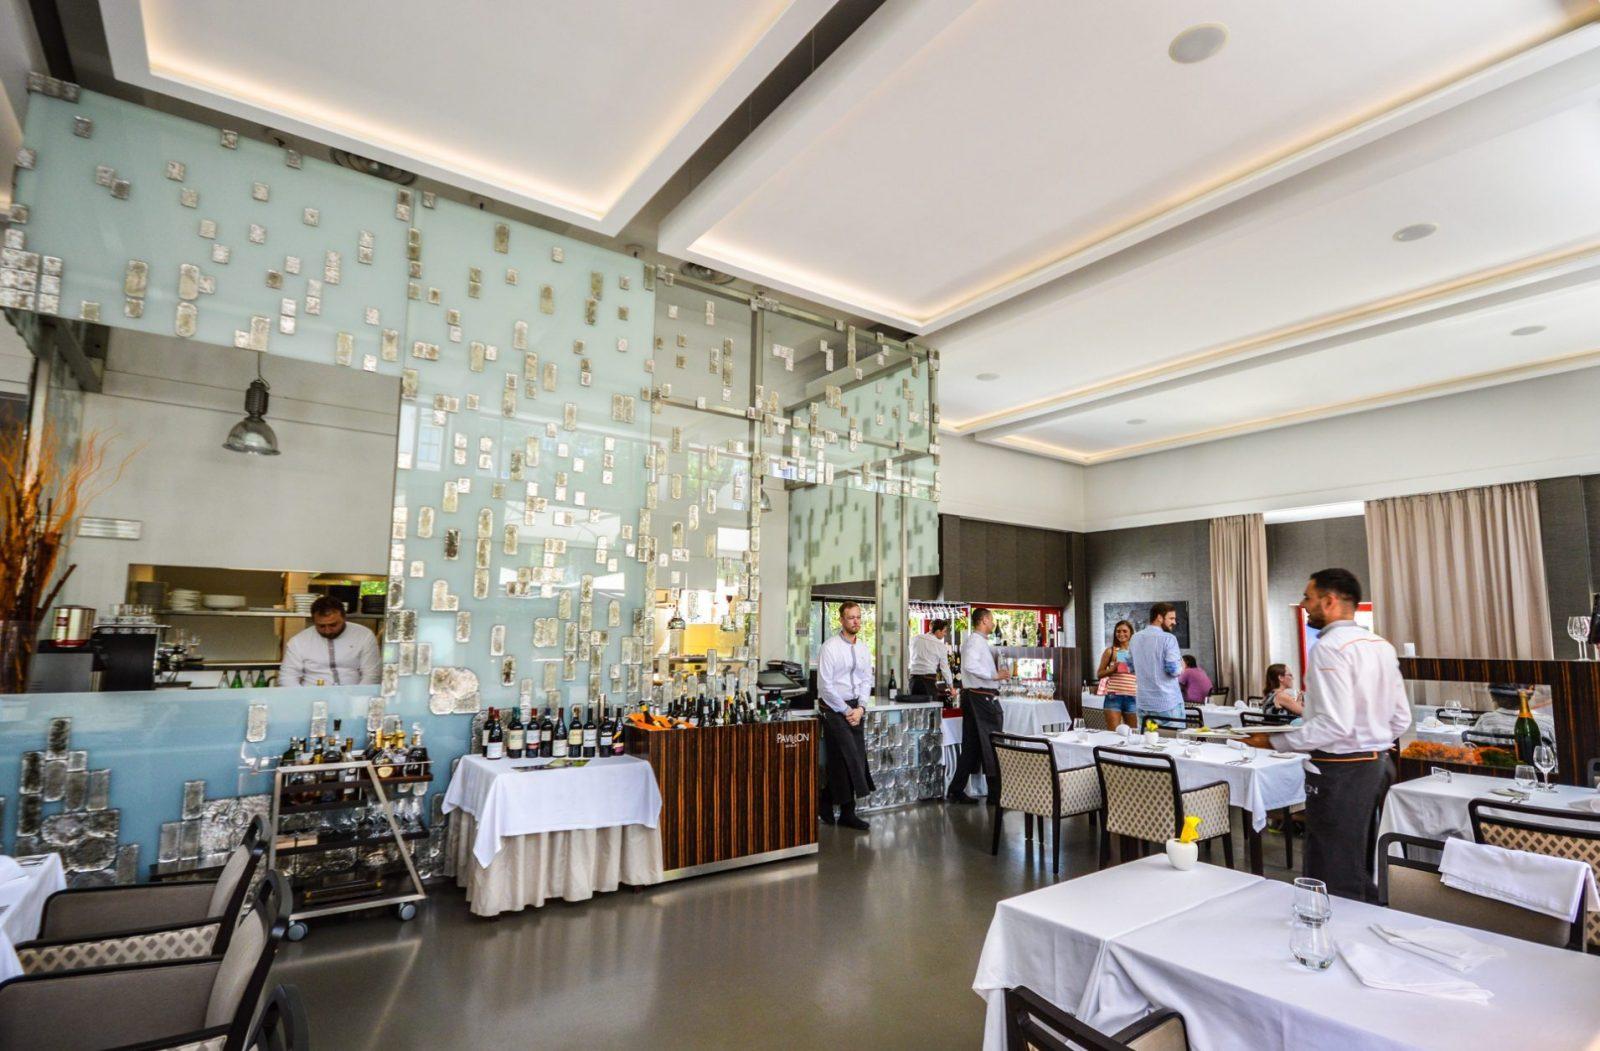 Pavillon Restaurant in Brno Czech Republic